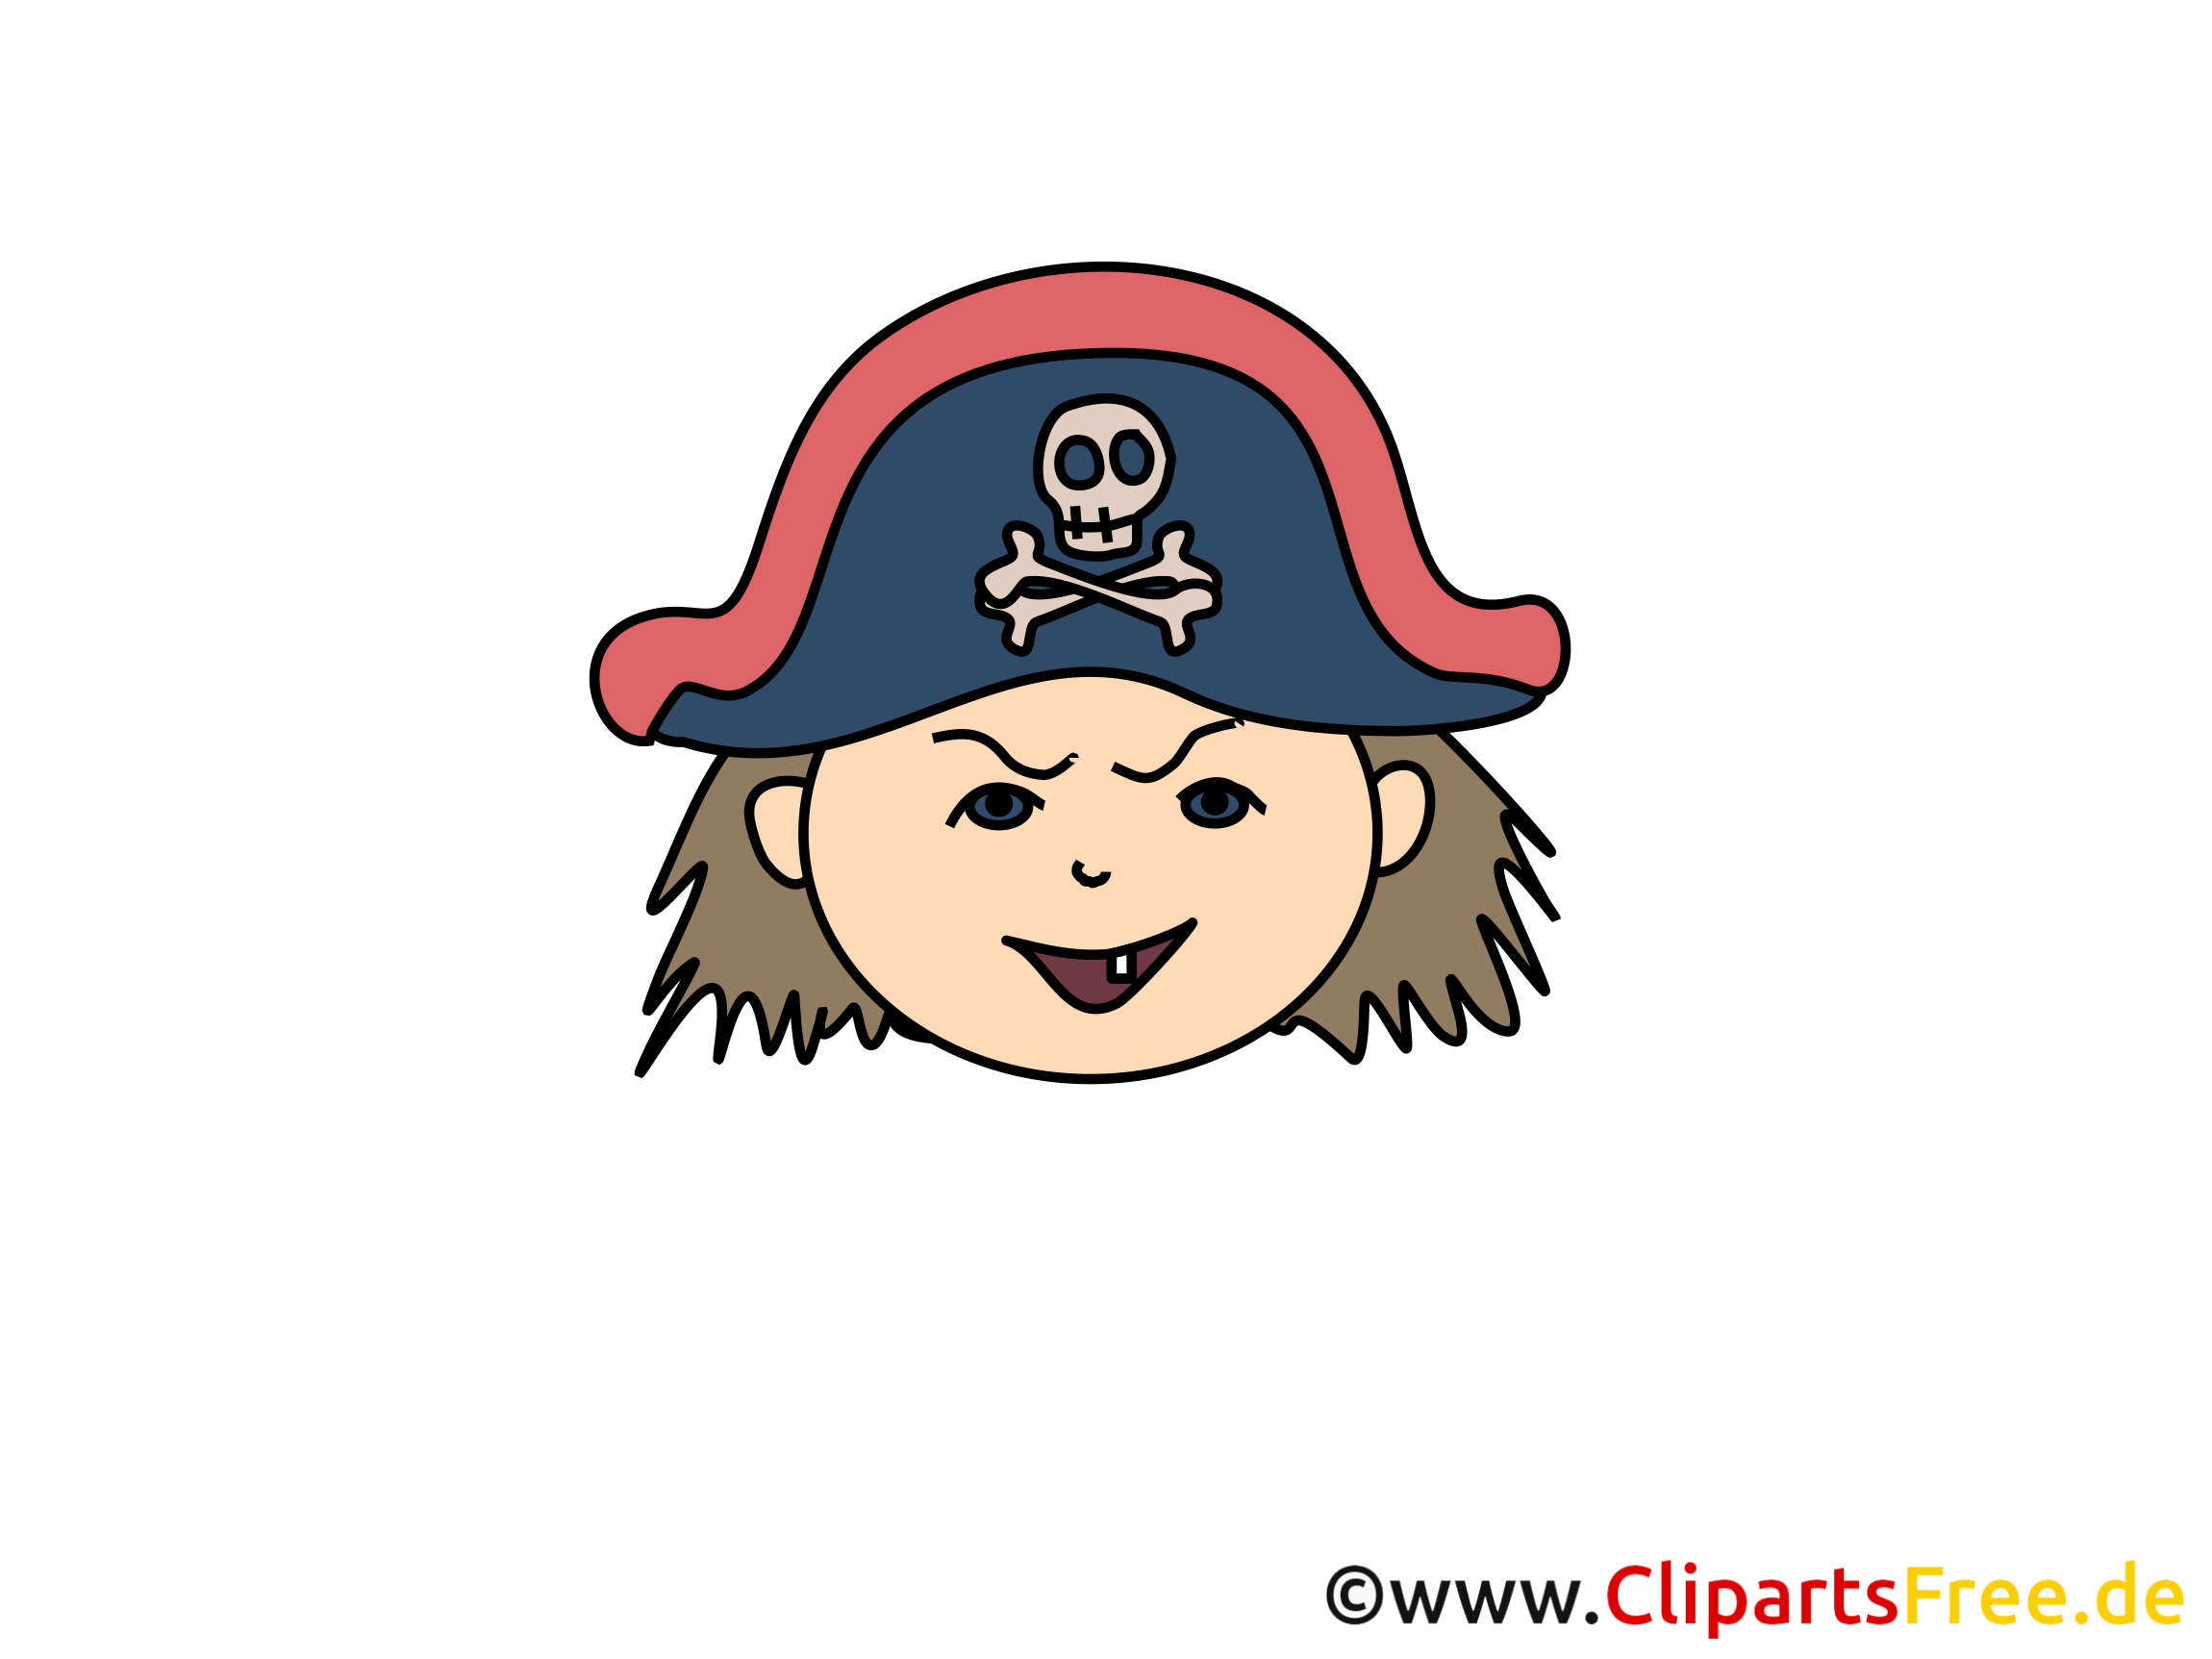 Pirate clipart – Émoticônes dessins gratuits